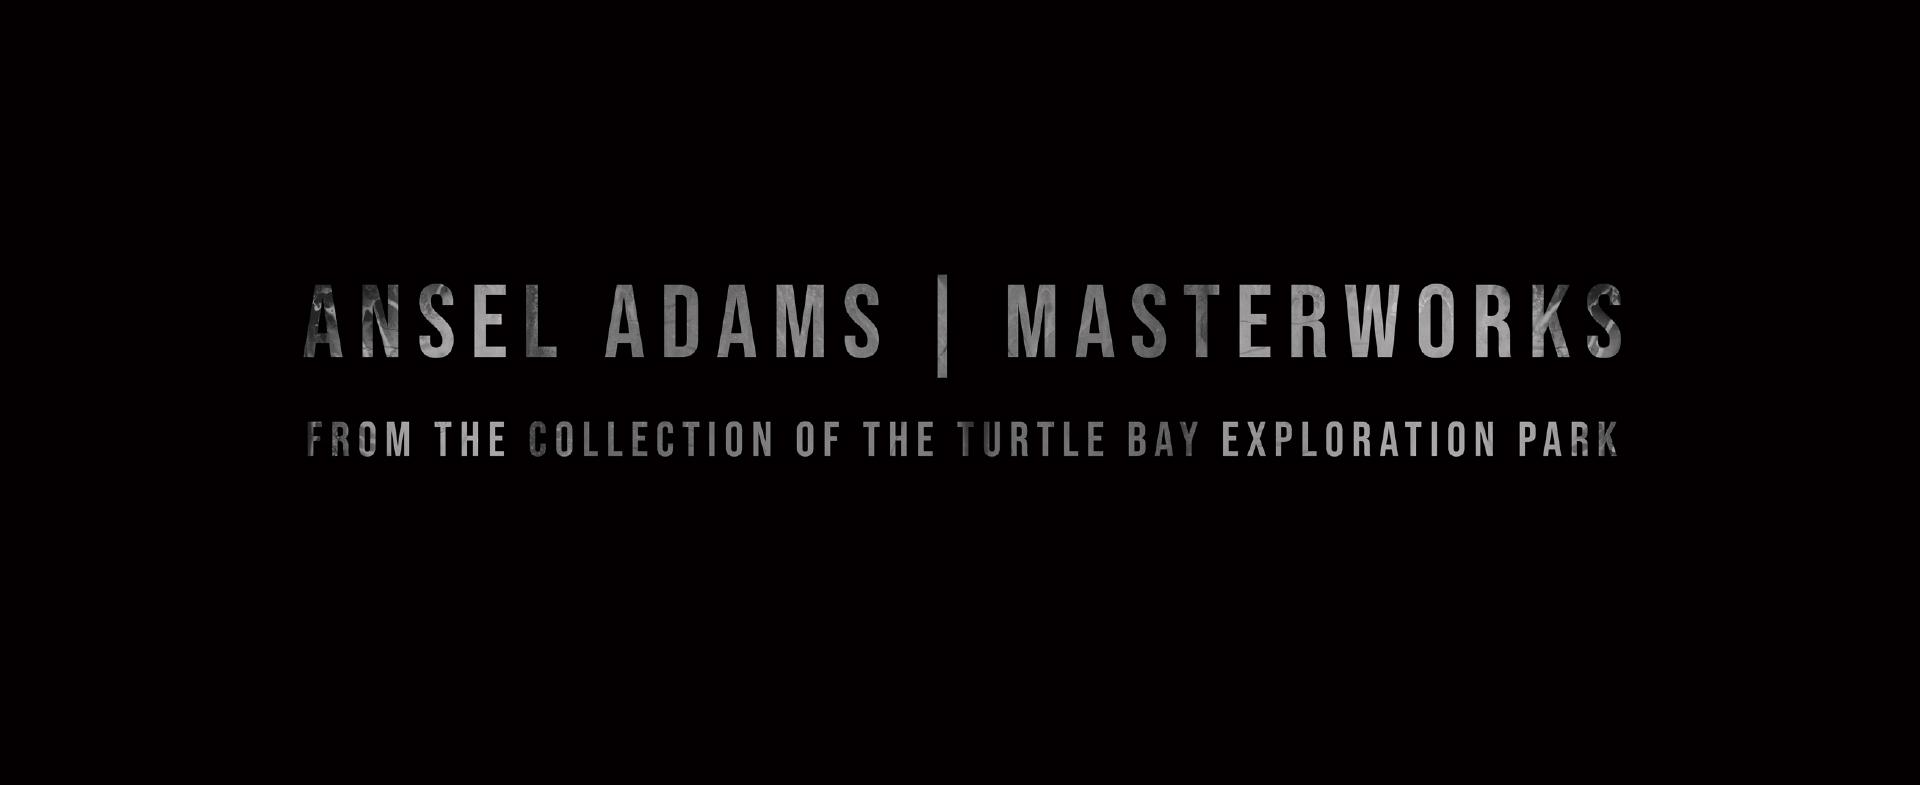 Ansel Adams: Masterworks